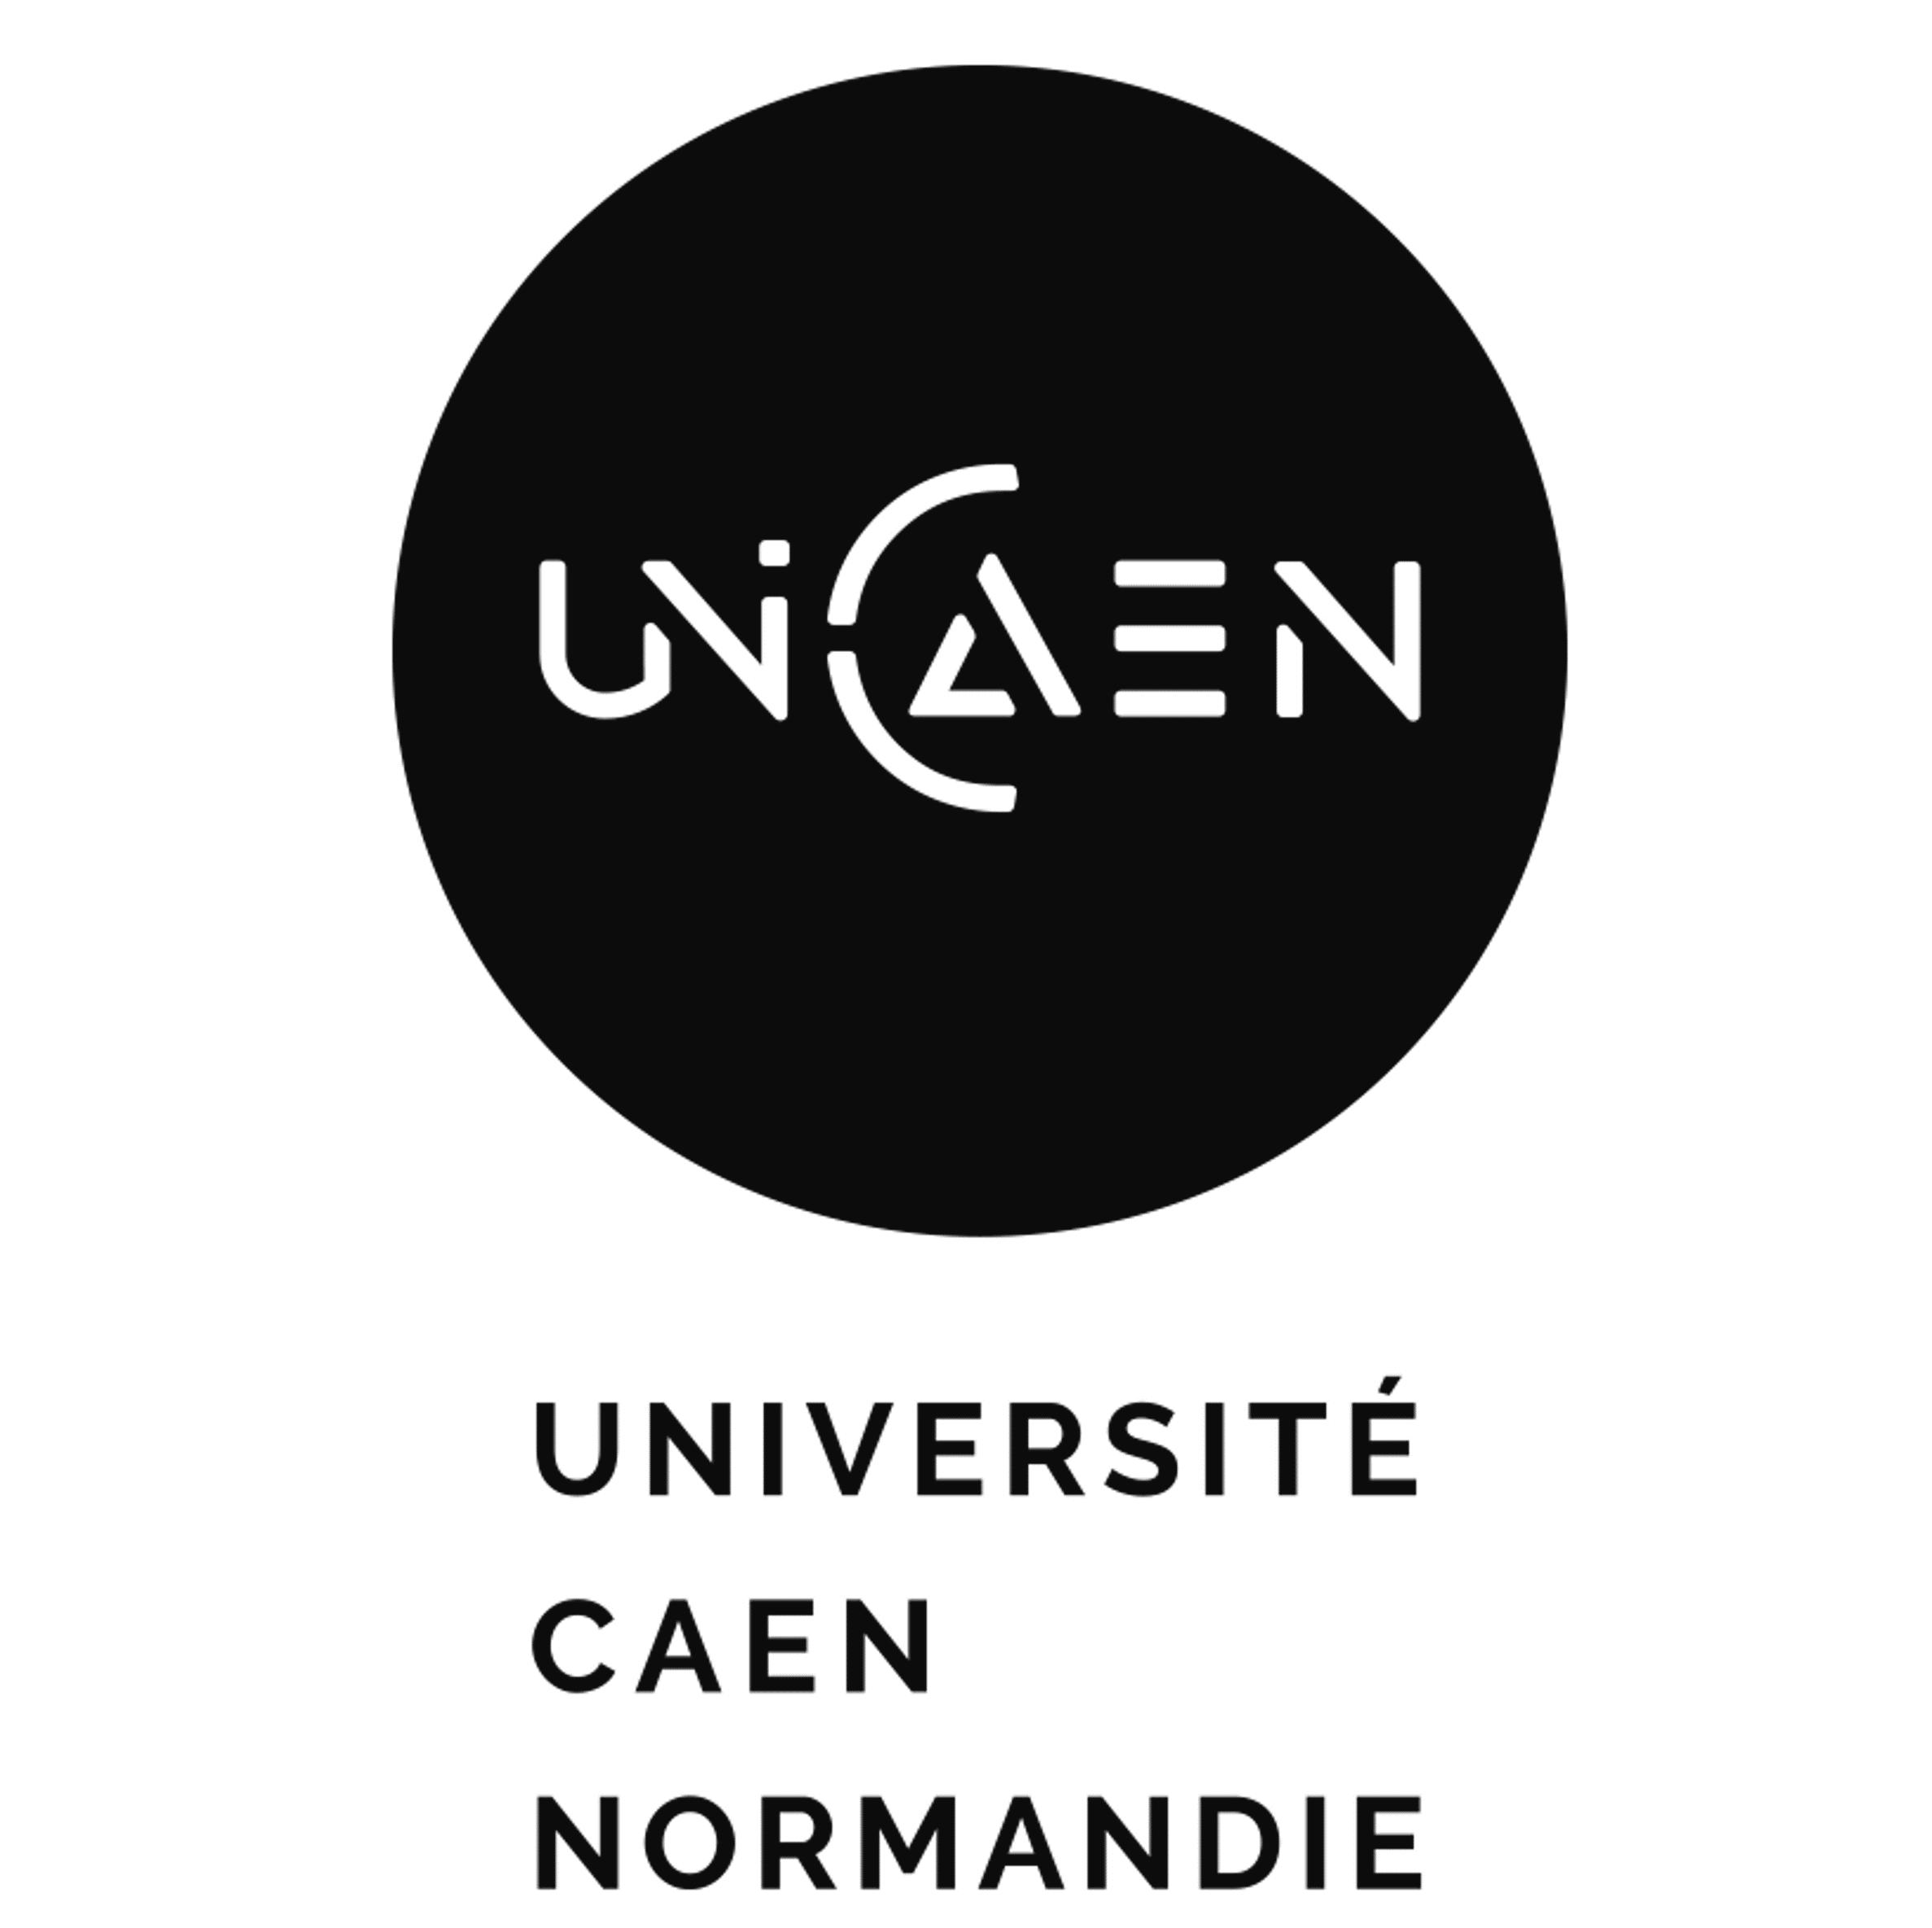 Logo UNIVERSITE DE CAEN NORMANDIE - UNICAEN